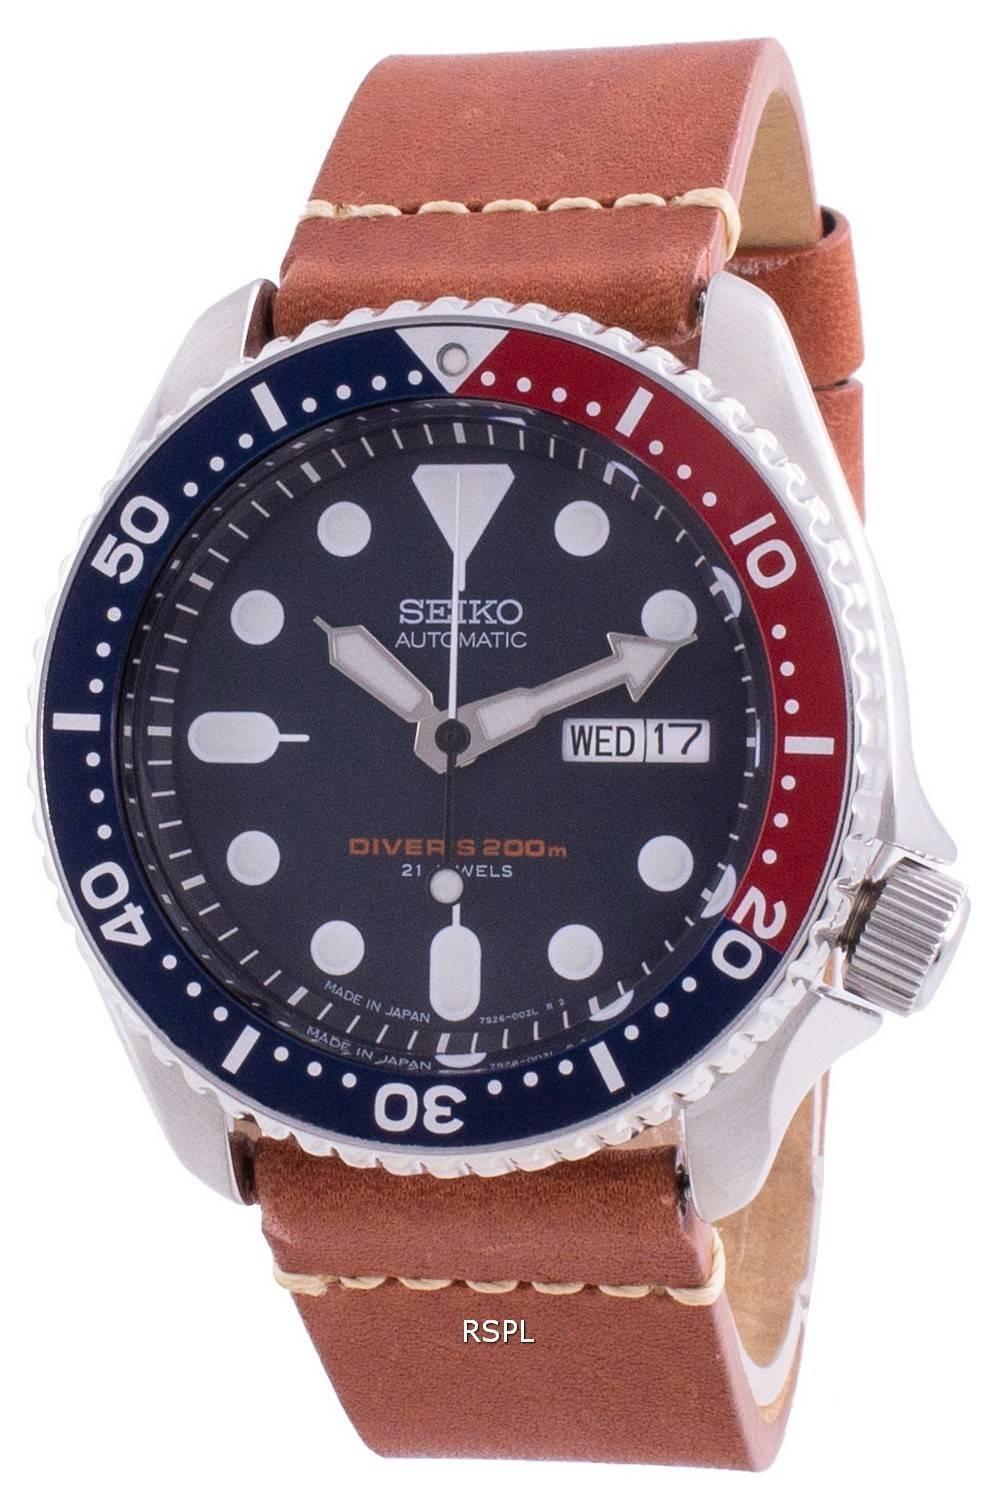 Seiko Automatic Diver&#39,s SKX009J1-var-LS21 200M Japan Made Miesten kello